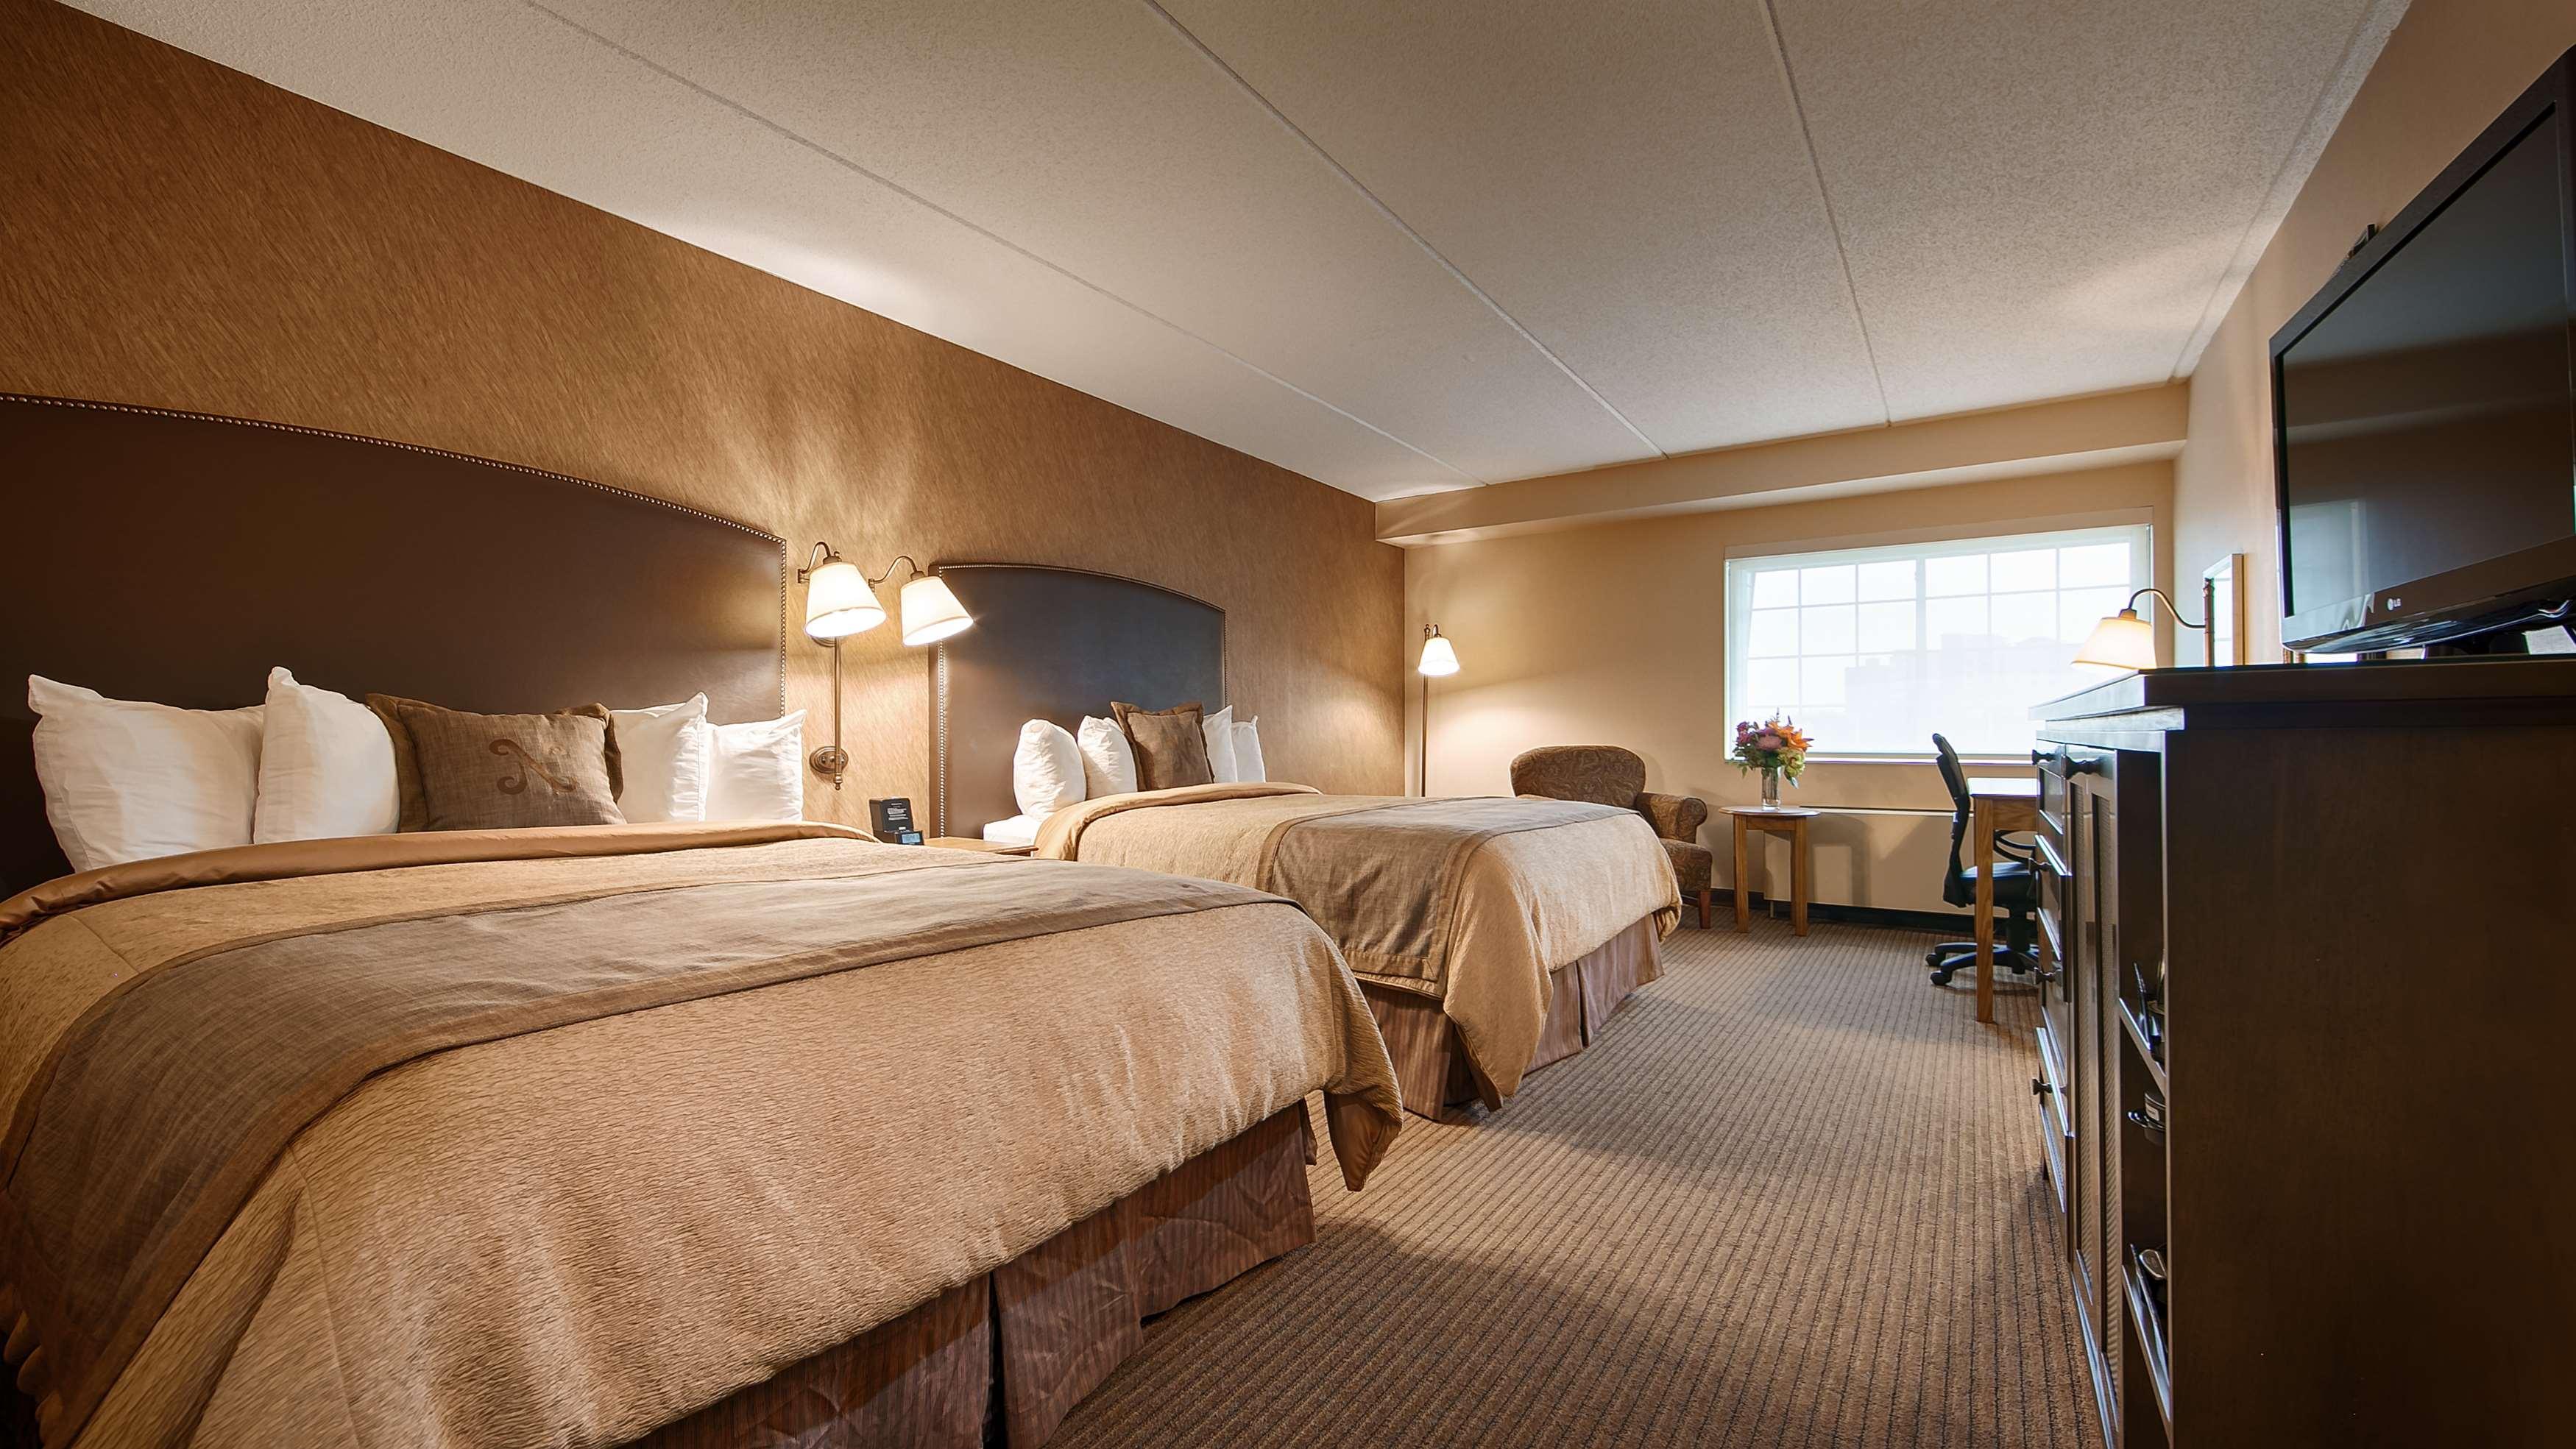 Best Western Plus The Normandy Inn & Suites image 8